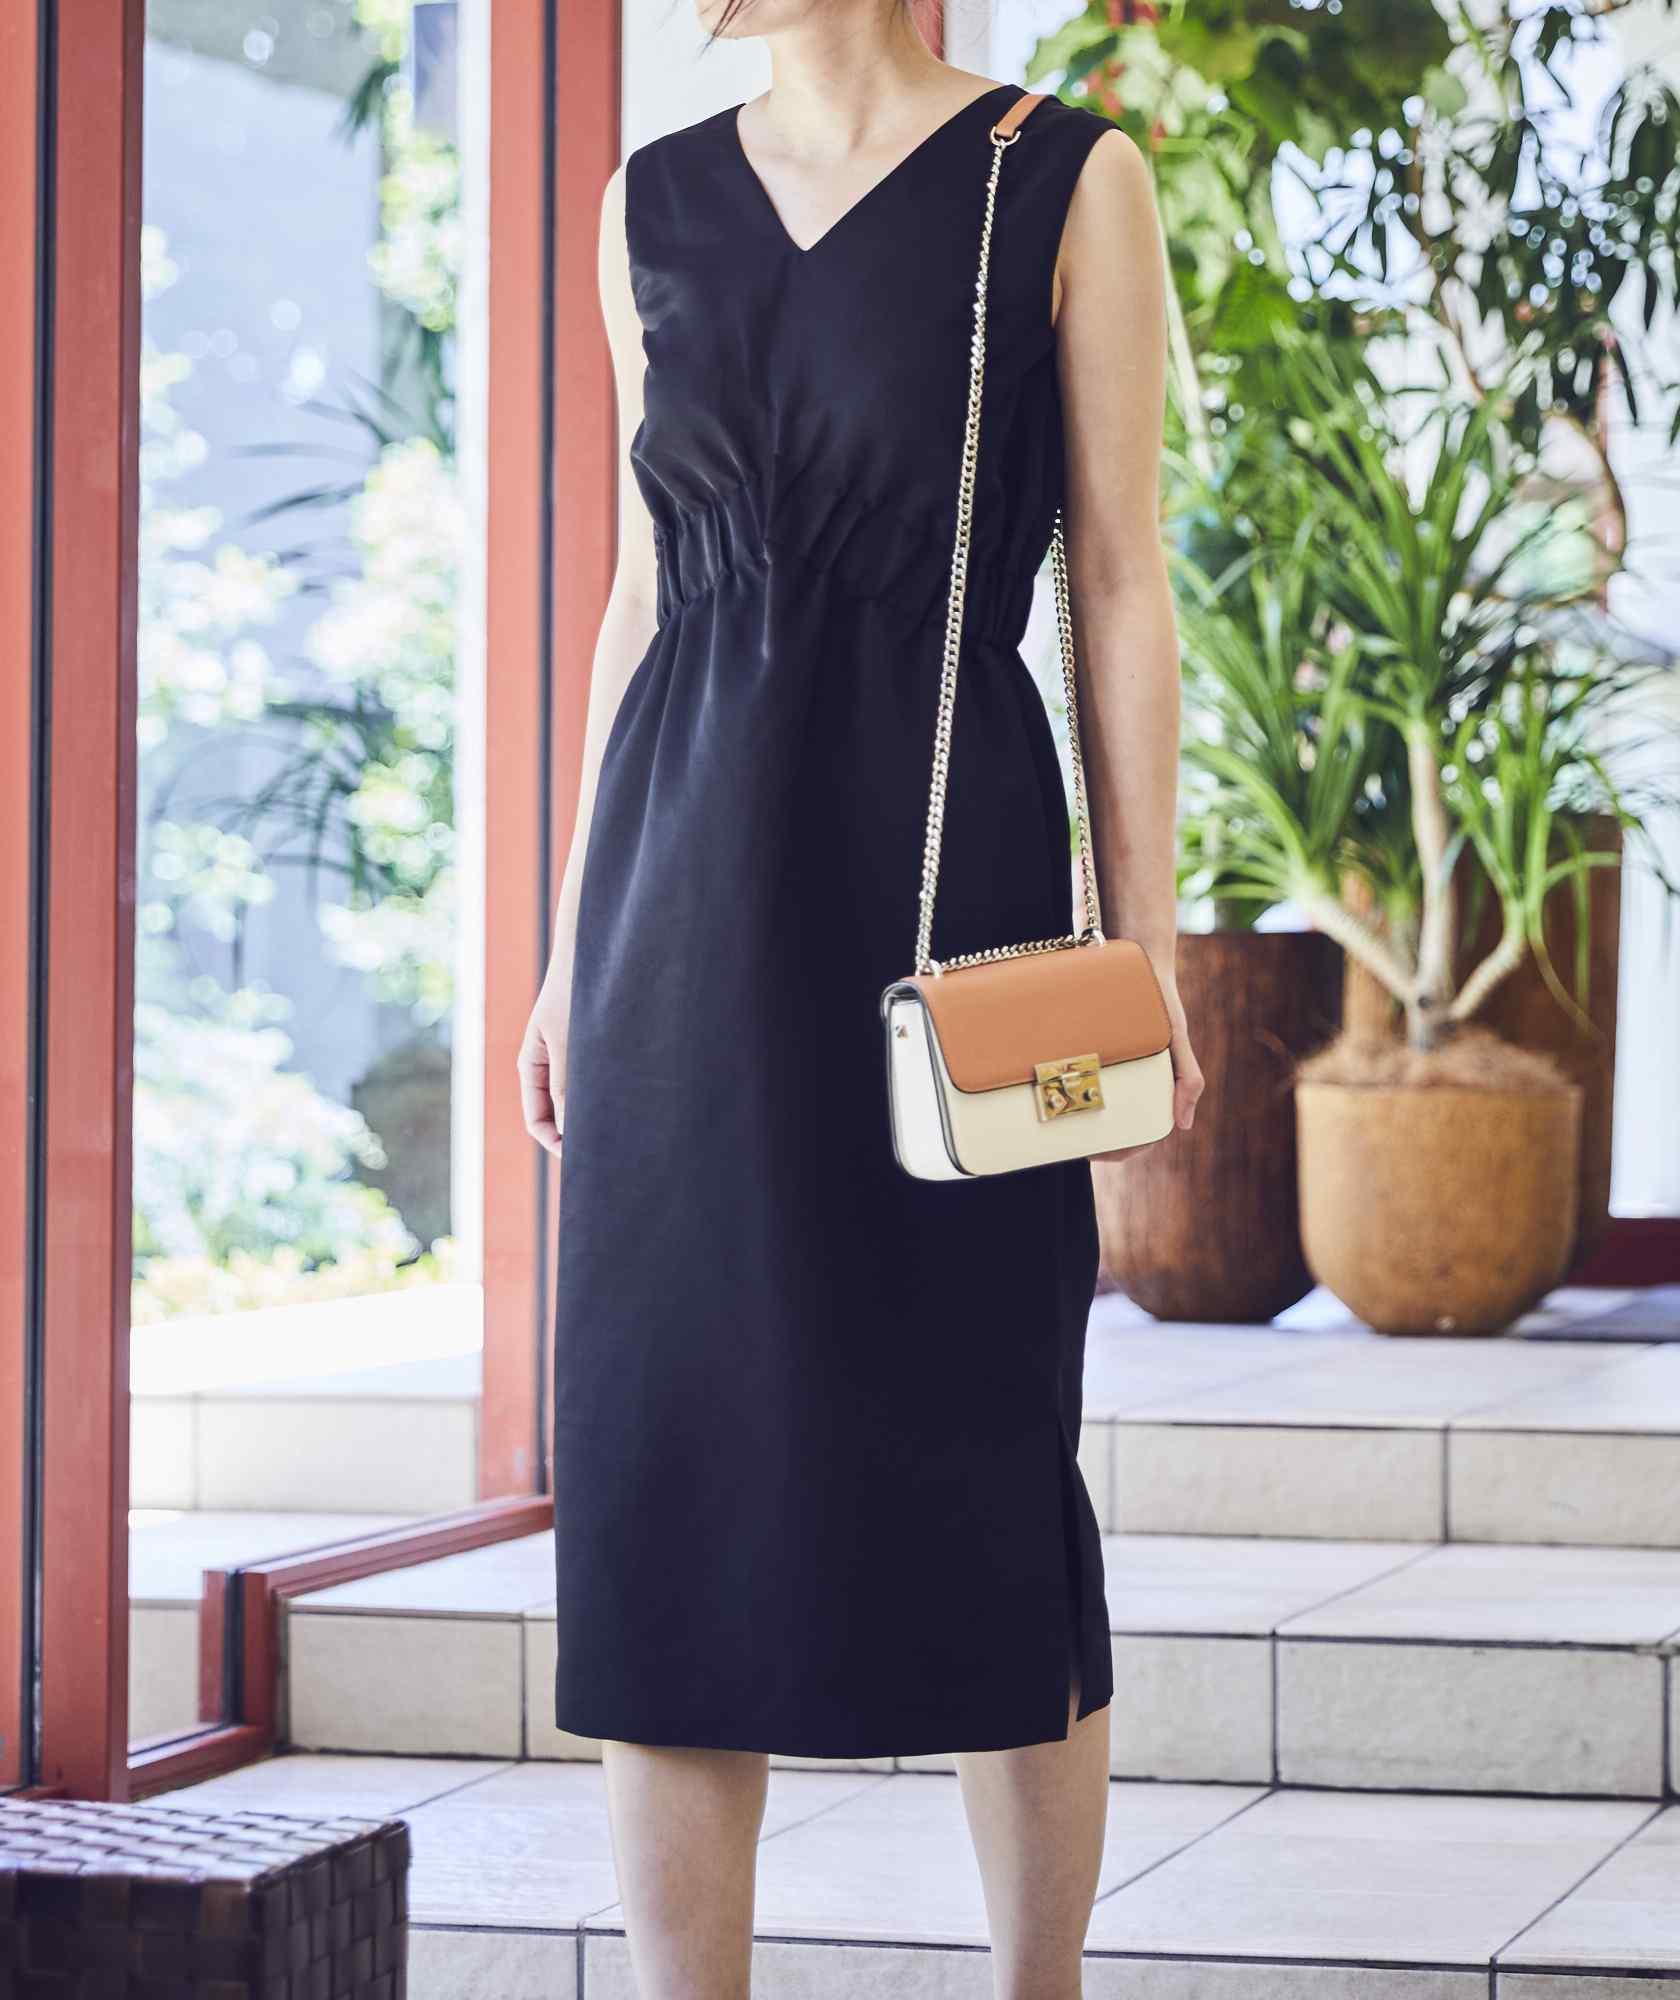 VネックシャーリングOGタイトミディアムドレス-ブラック-S